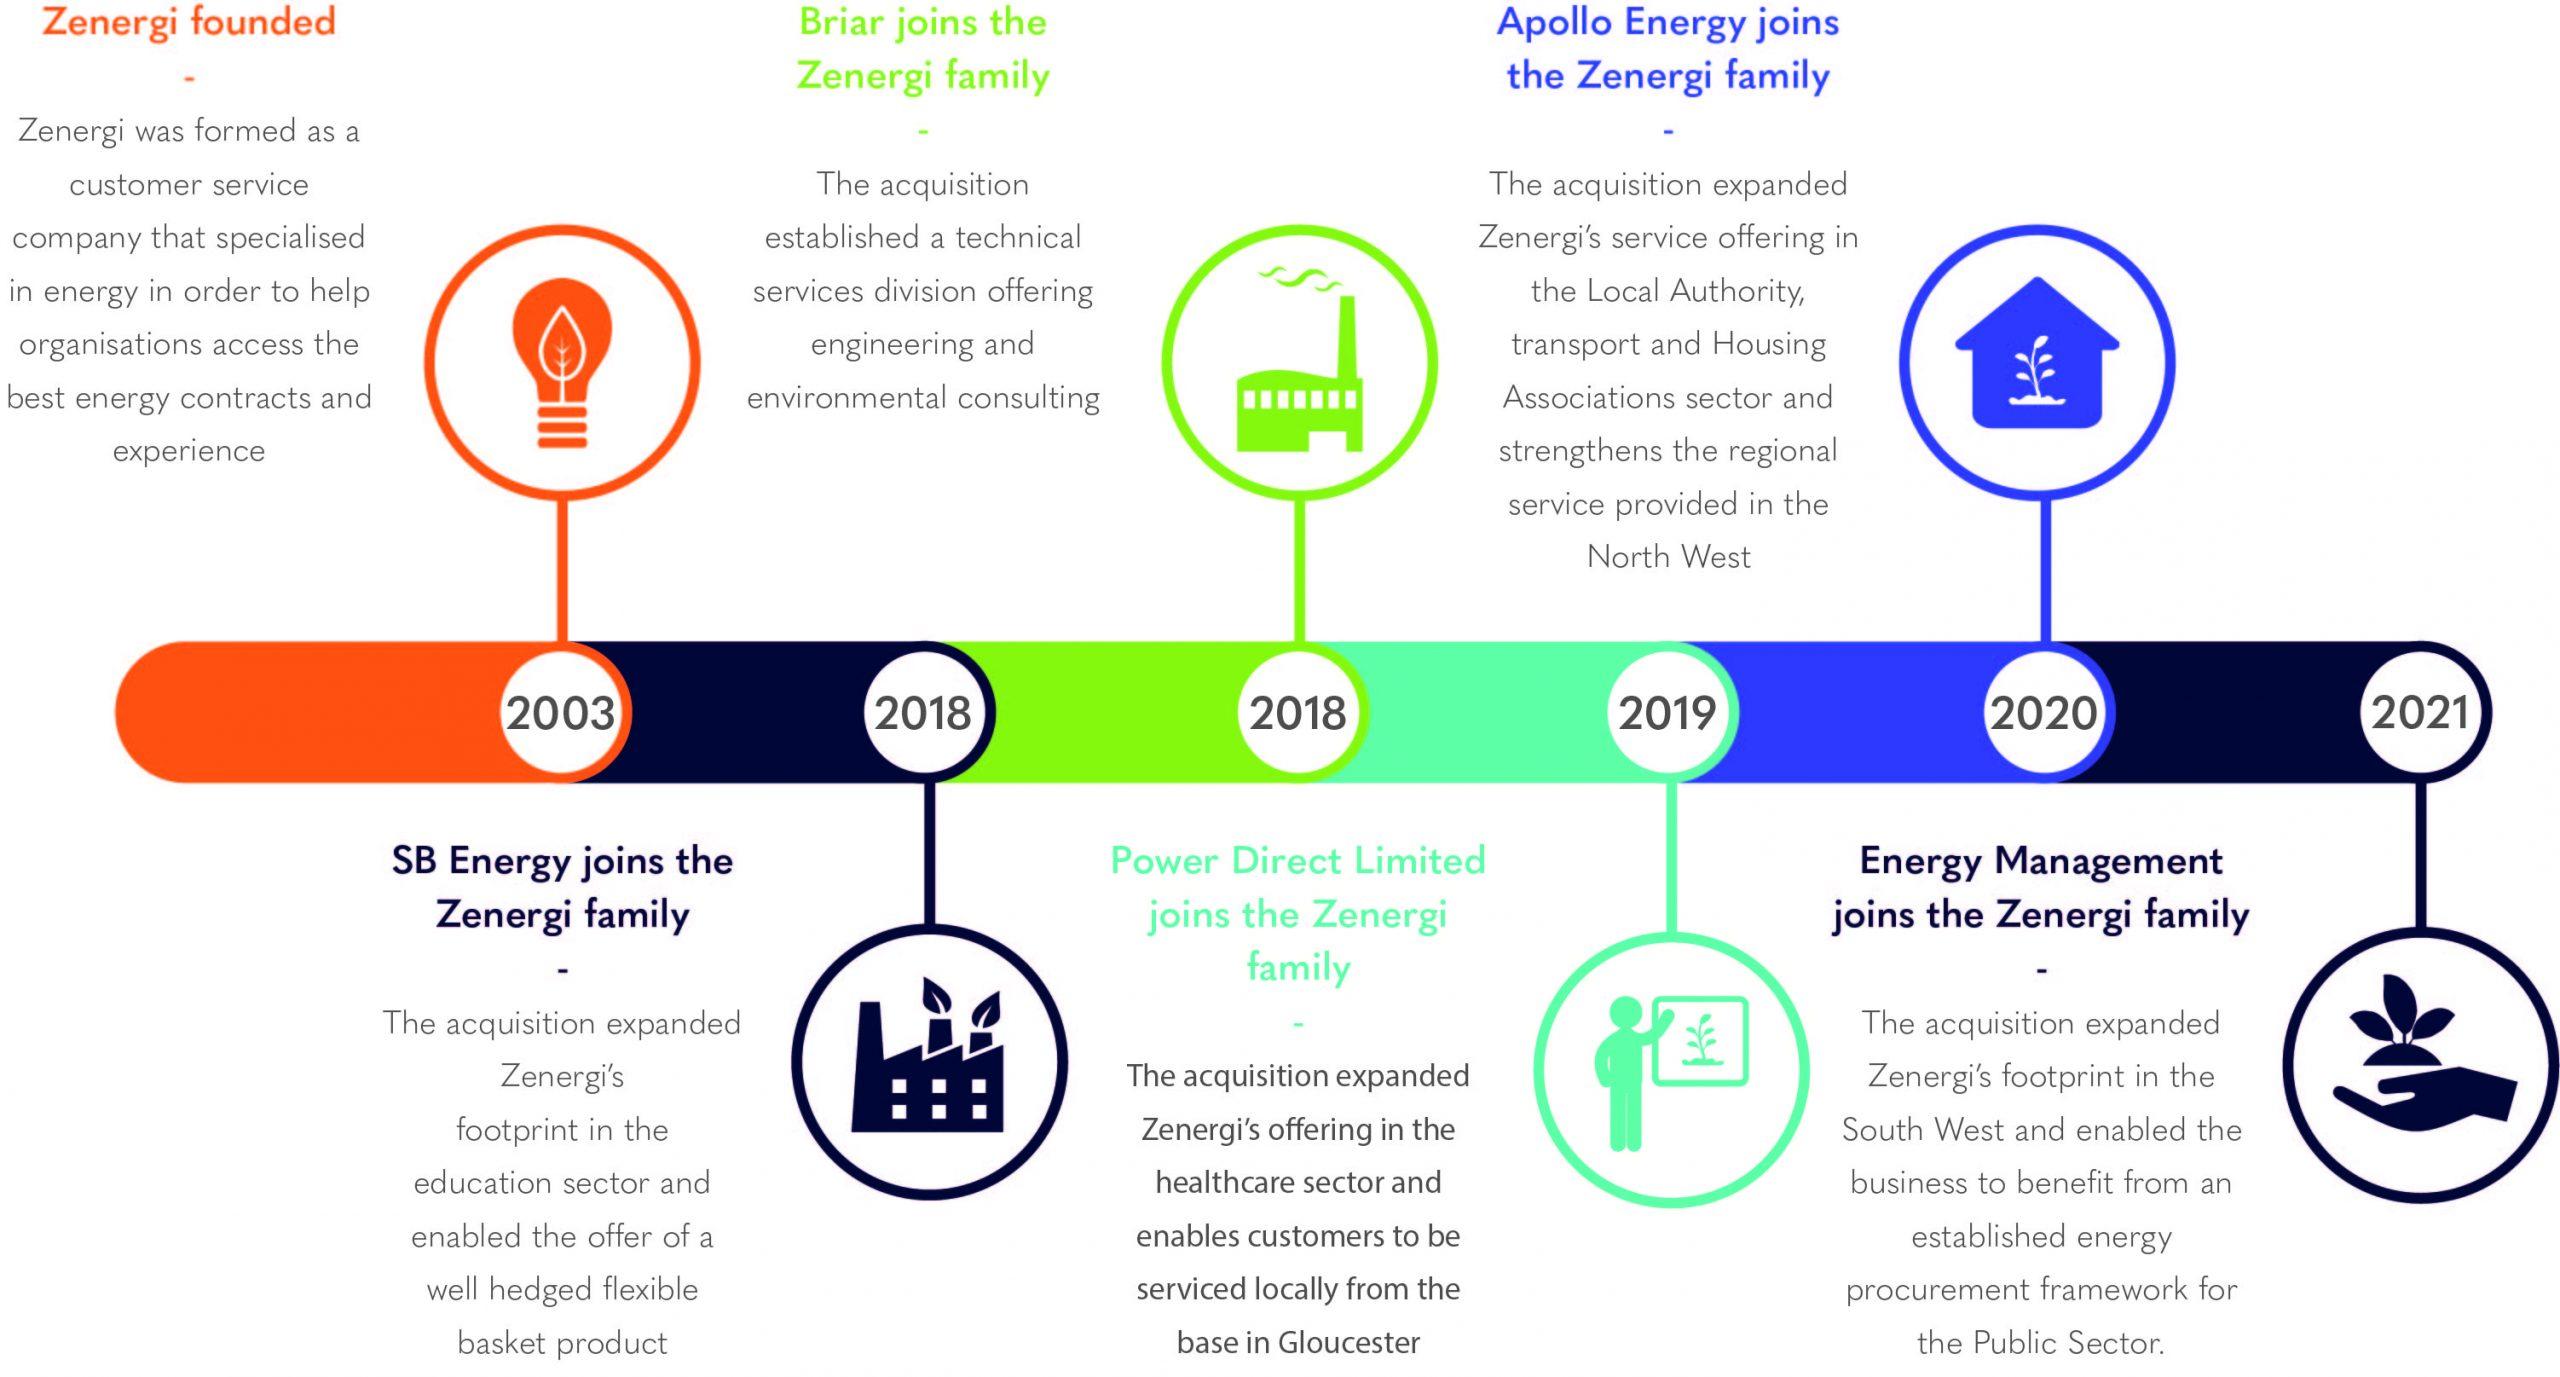 Timeline of the Zenergi Group